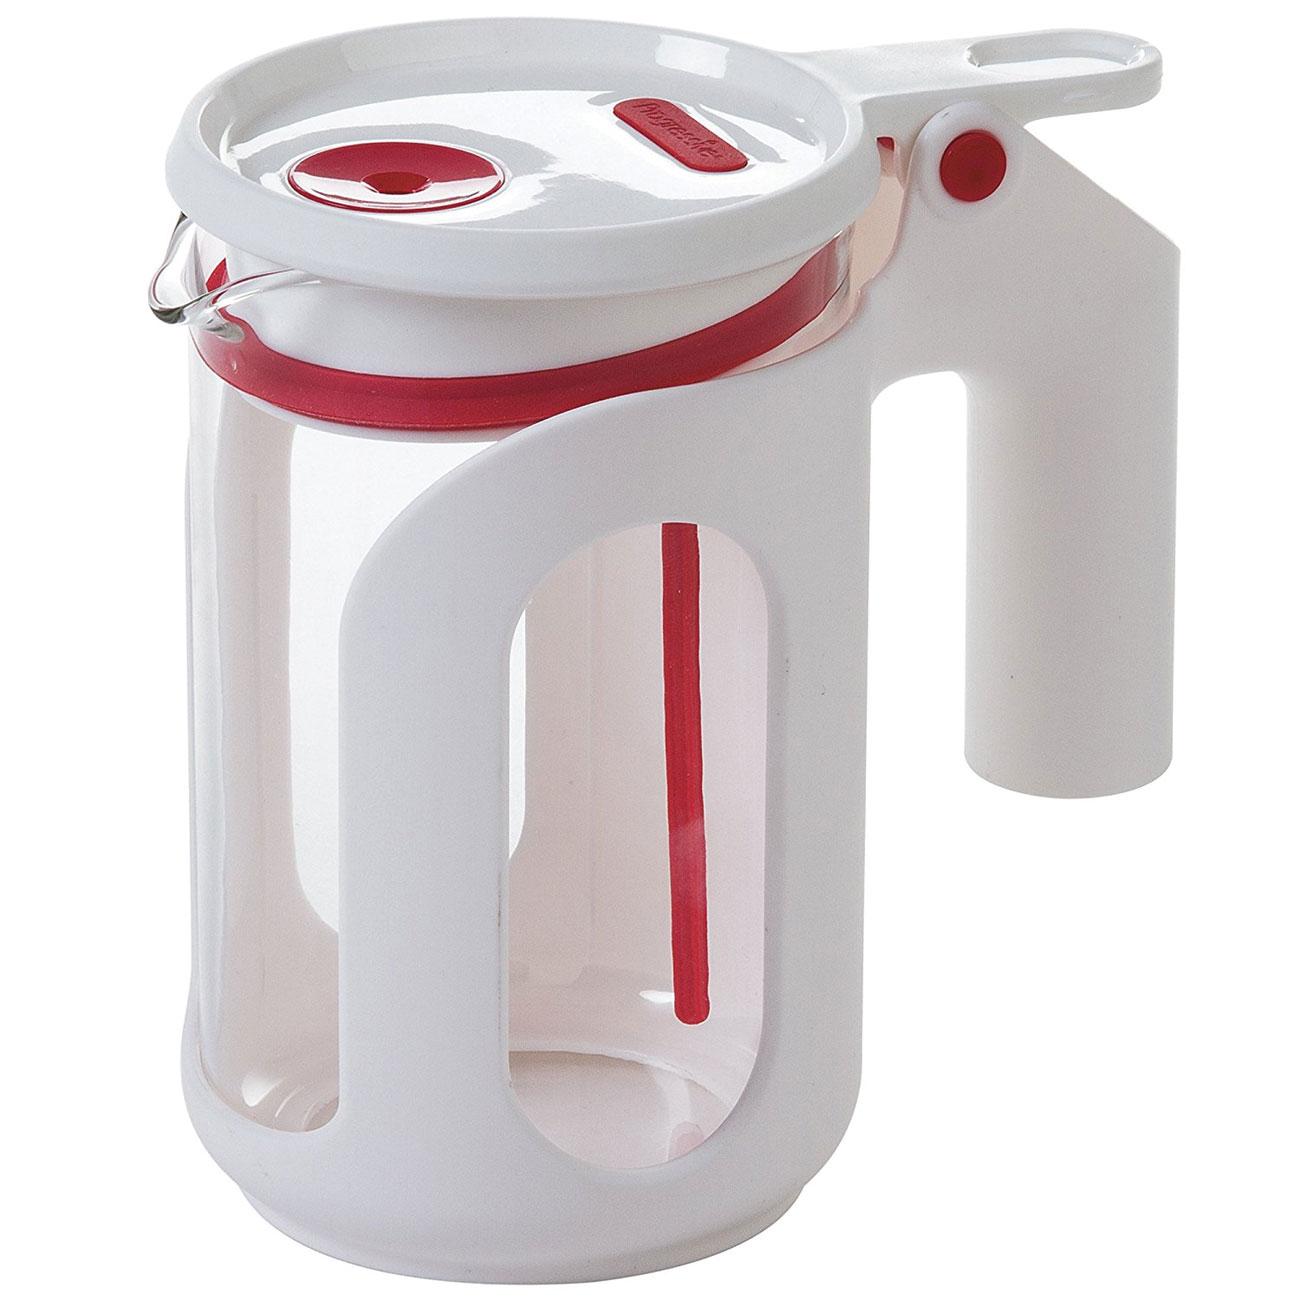 Prep Solutions Microwave Whistling Tea Kettle